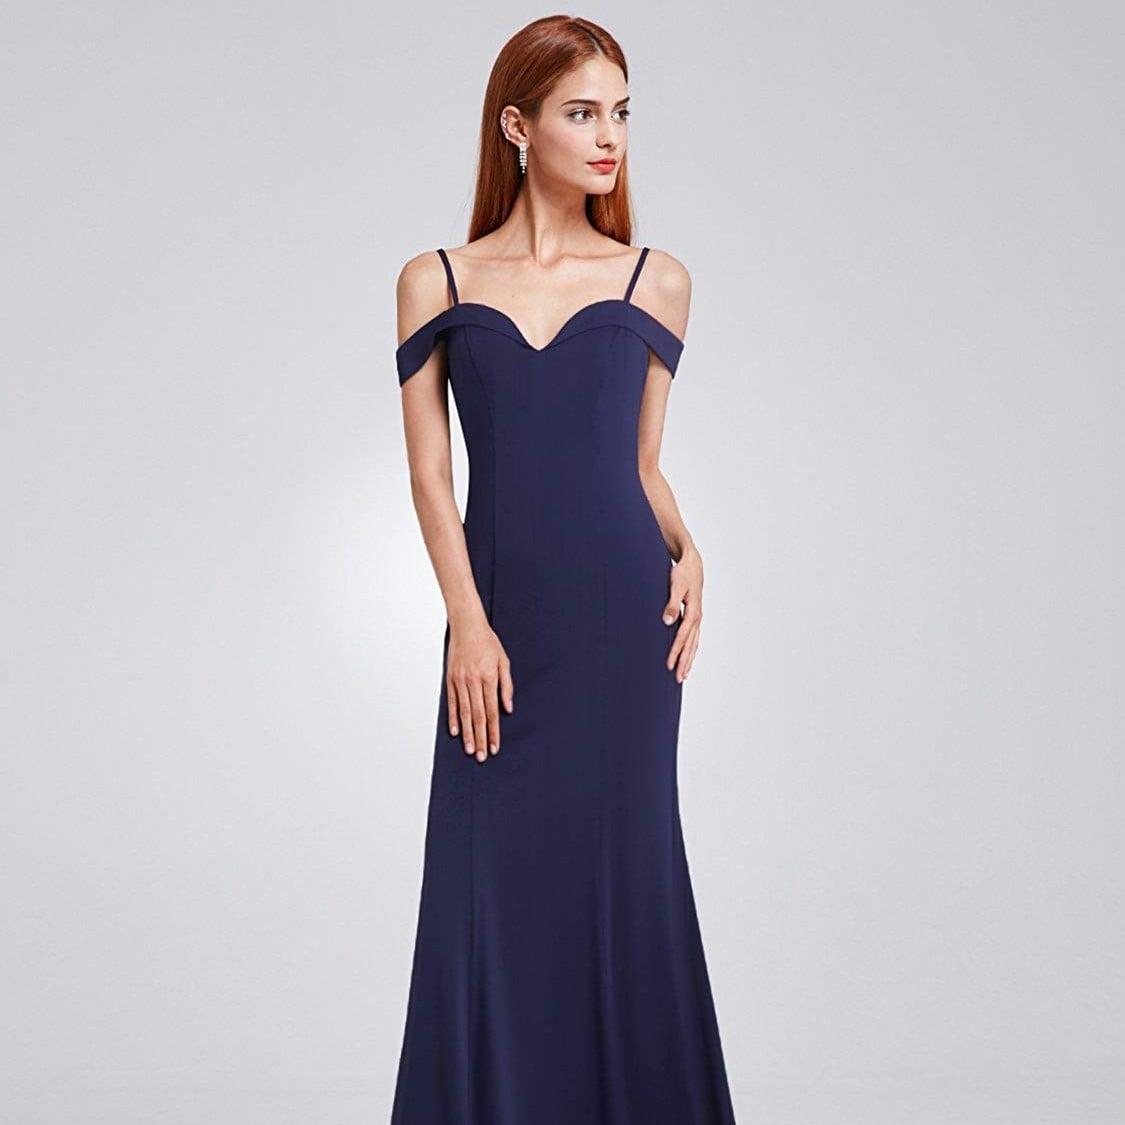 Best Formal Dresses on Amazon | POPSUGAR Fashion